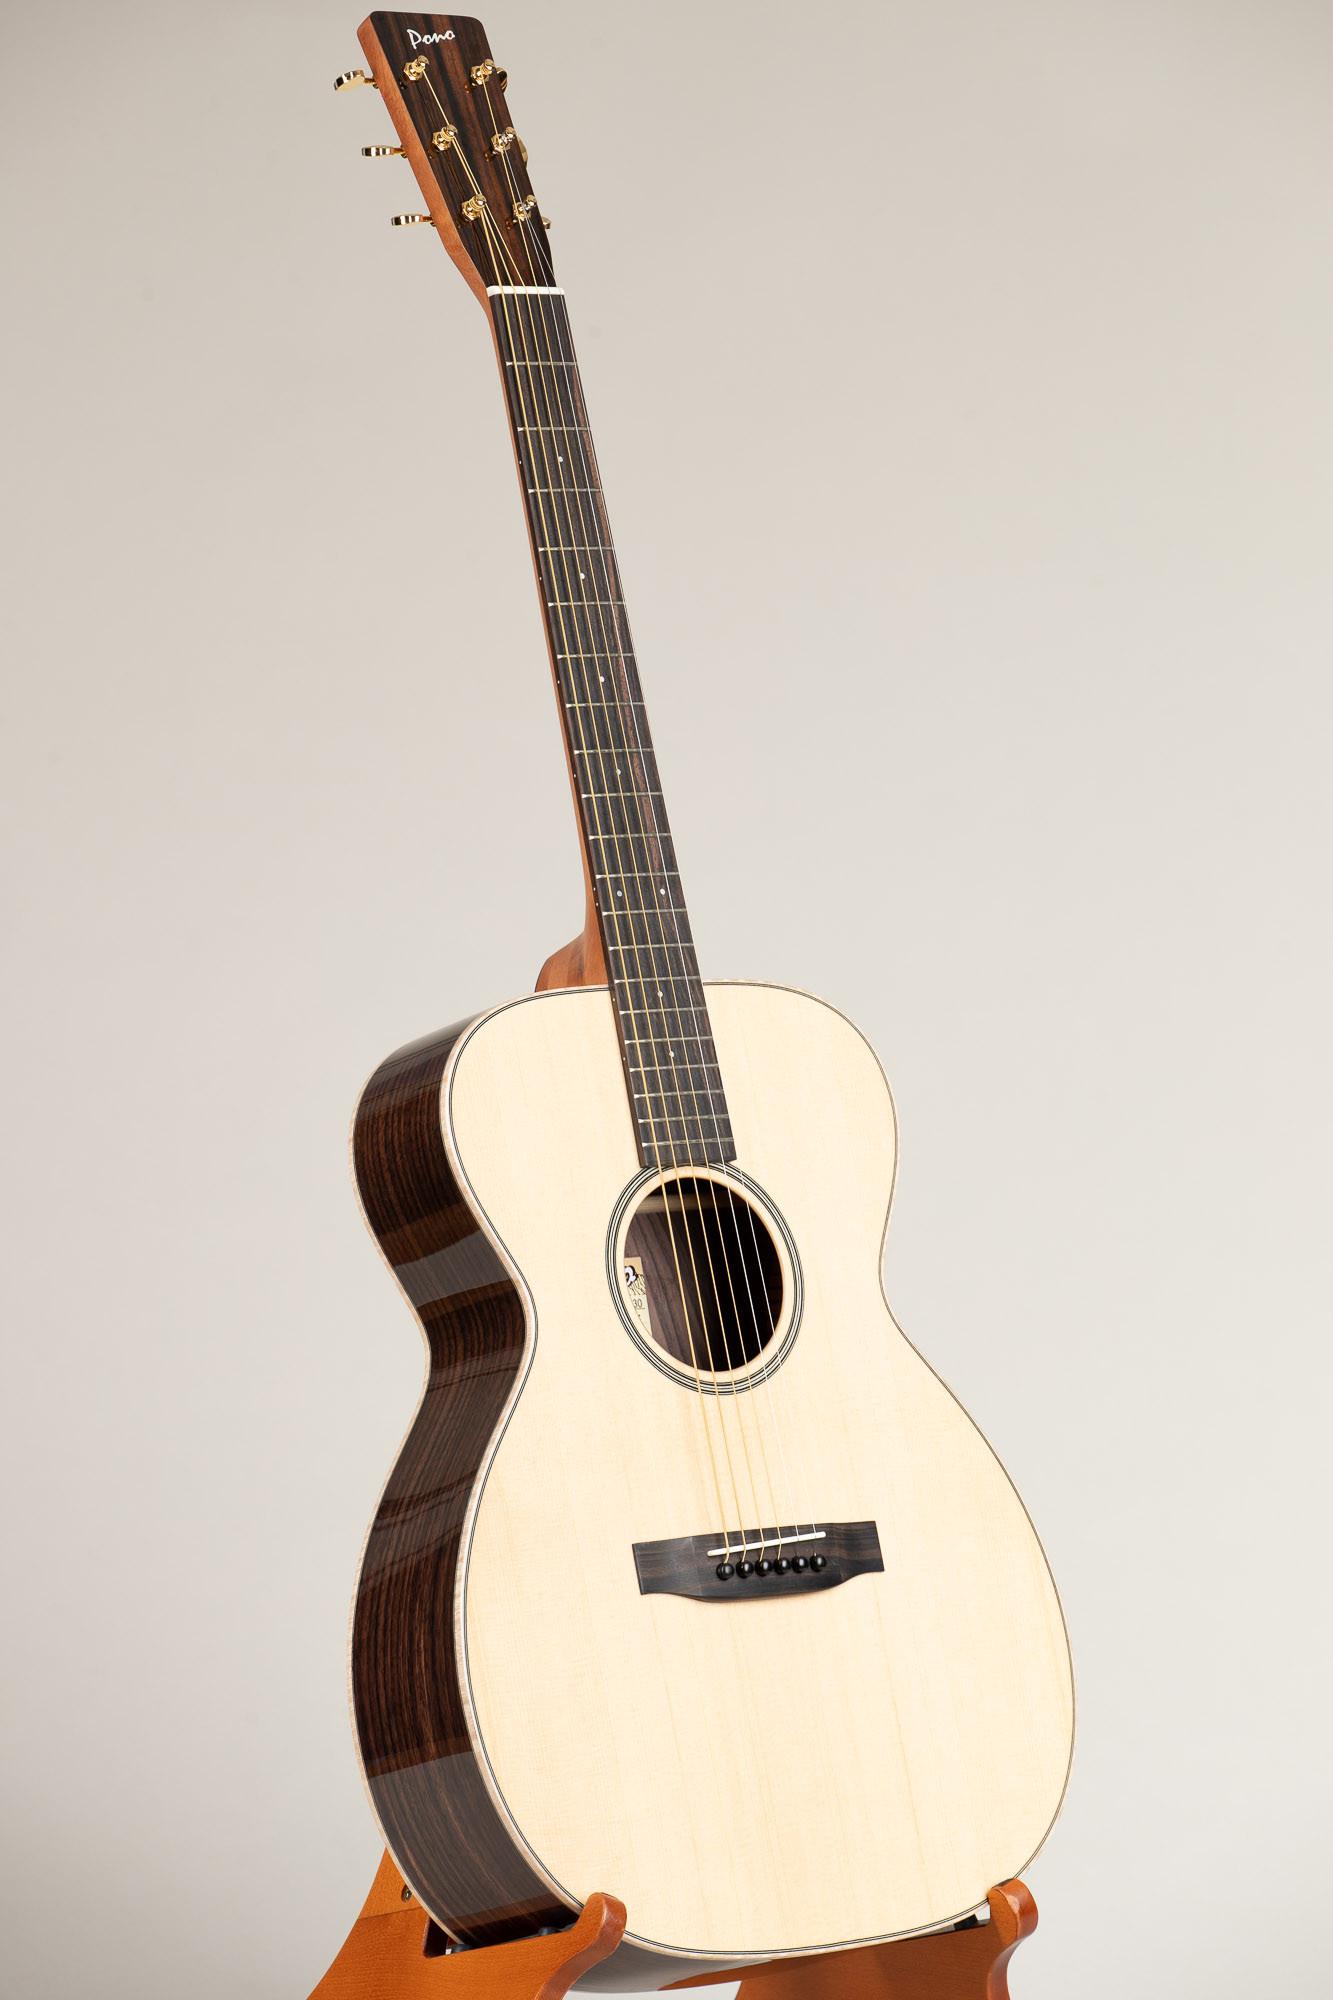 Pono Spruce Top Rosewood OM Steel String Guitar (OM-30(S) 4681)